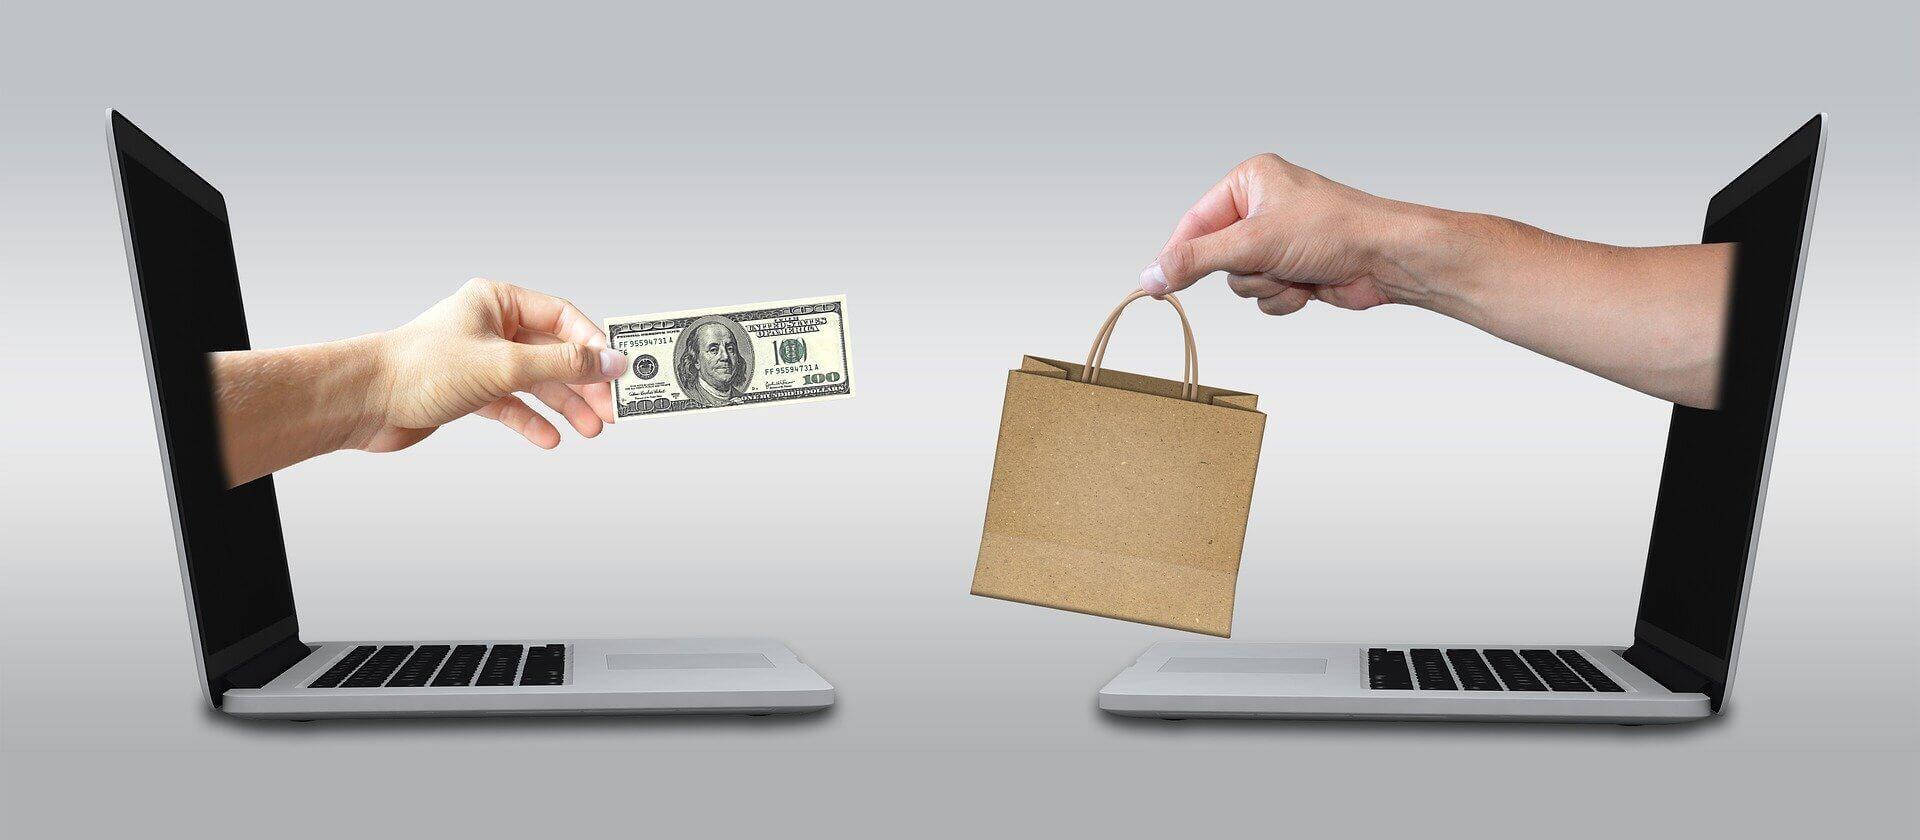 futuro do ecommerce